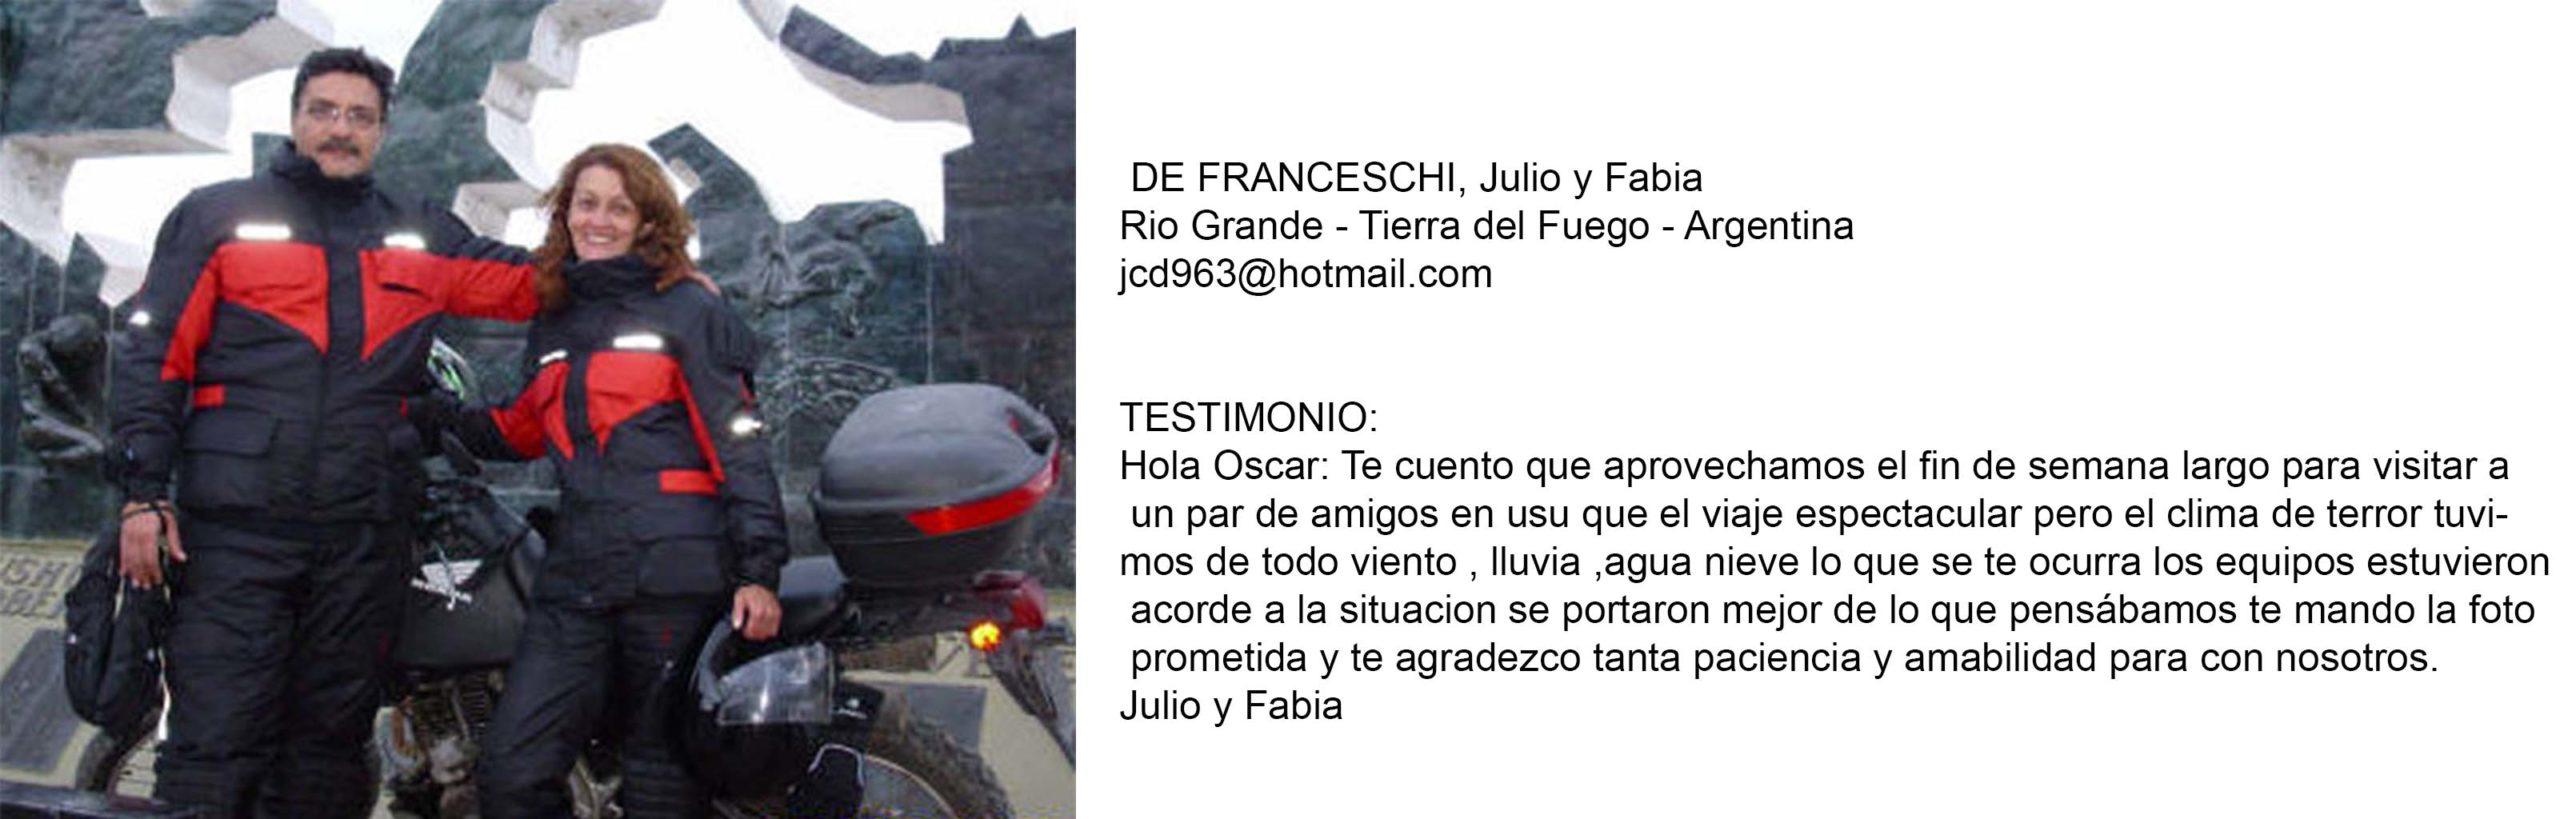 Testimonio Franceschi